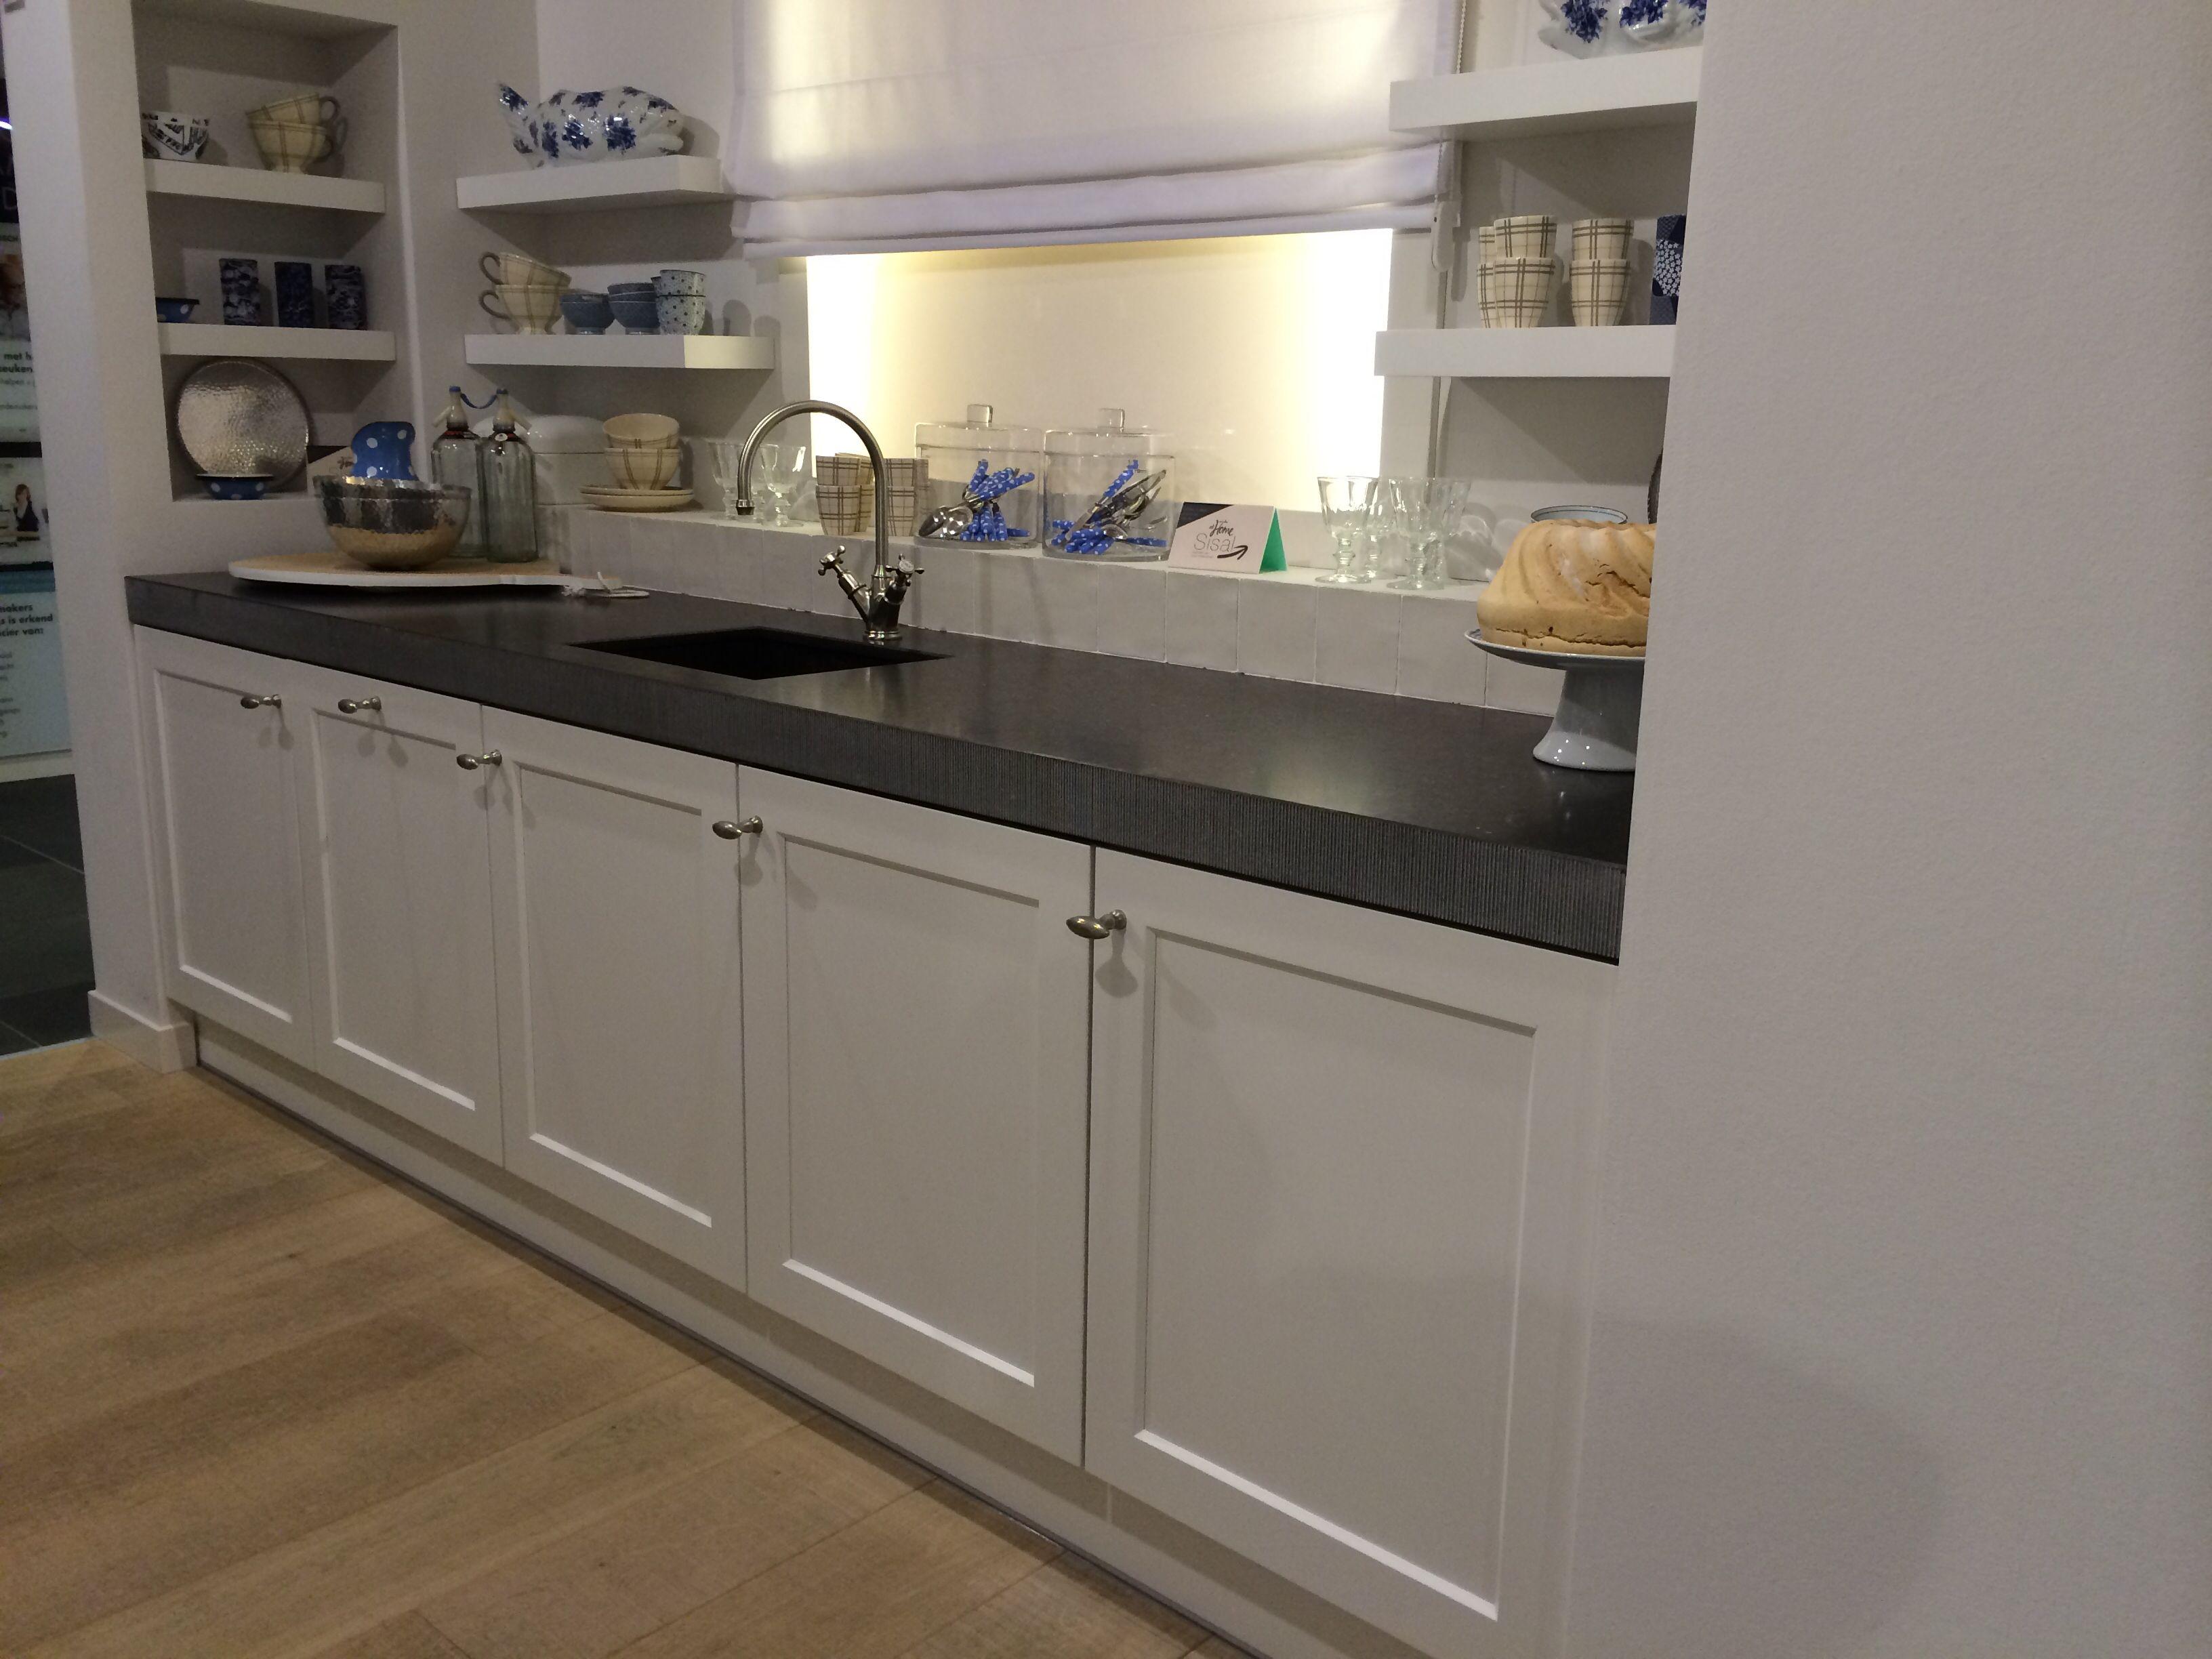 Spiksplinternieuw Onze keuken, landelijk en stoer. Ariadne at home keuken sisal MF-85